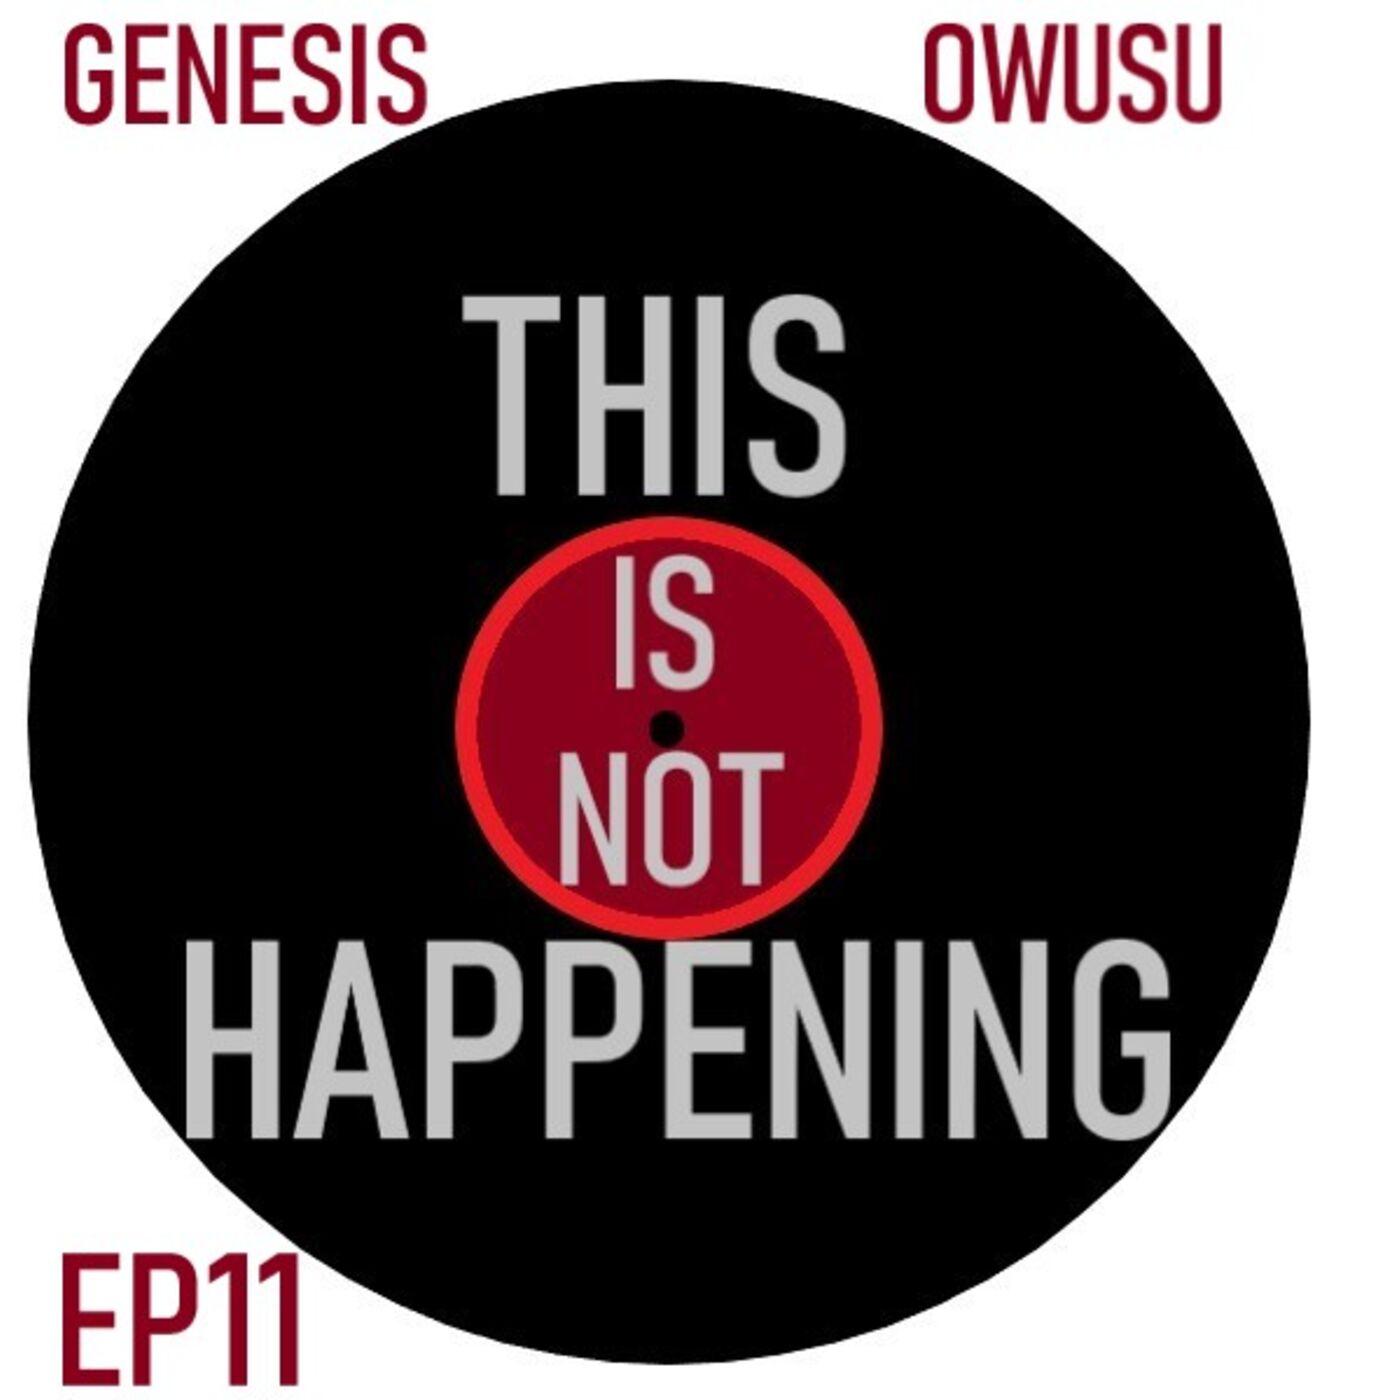 Ep11 - Genesis Owusu - Smiling With No Teeth